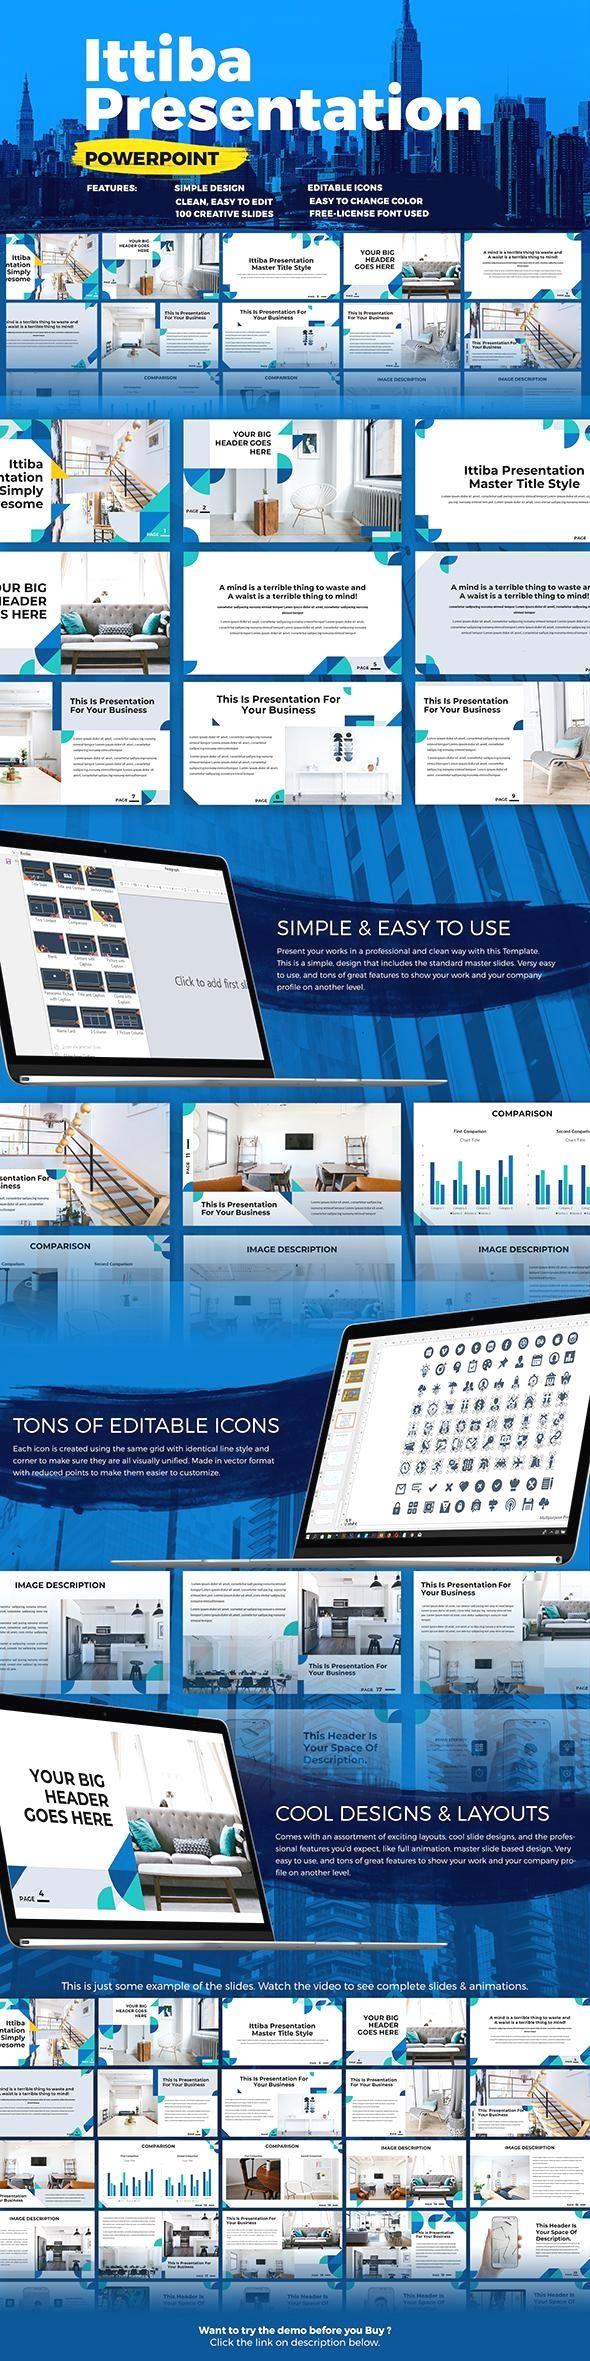 ittiba powerpoint presentation graphicriver presentation